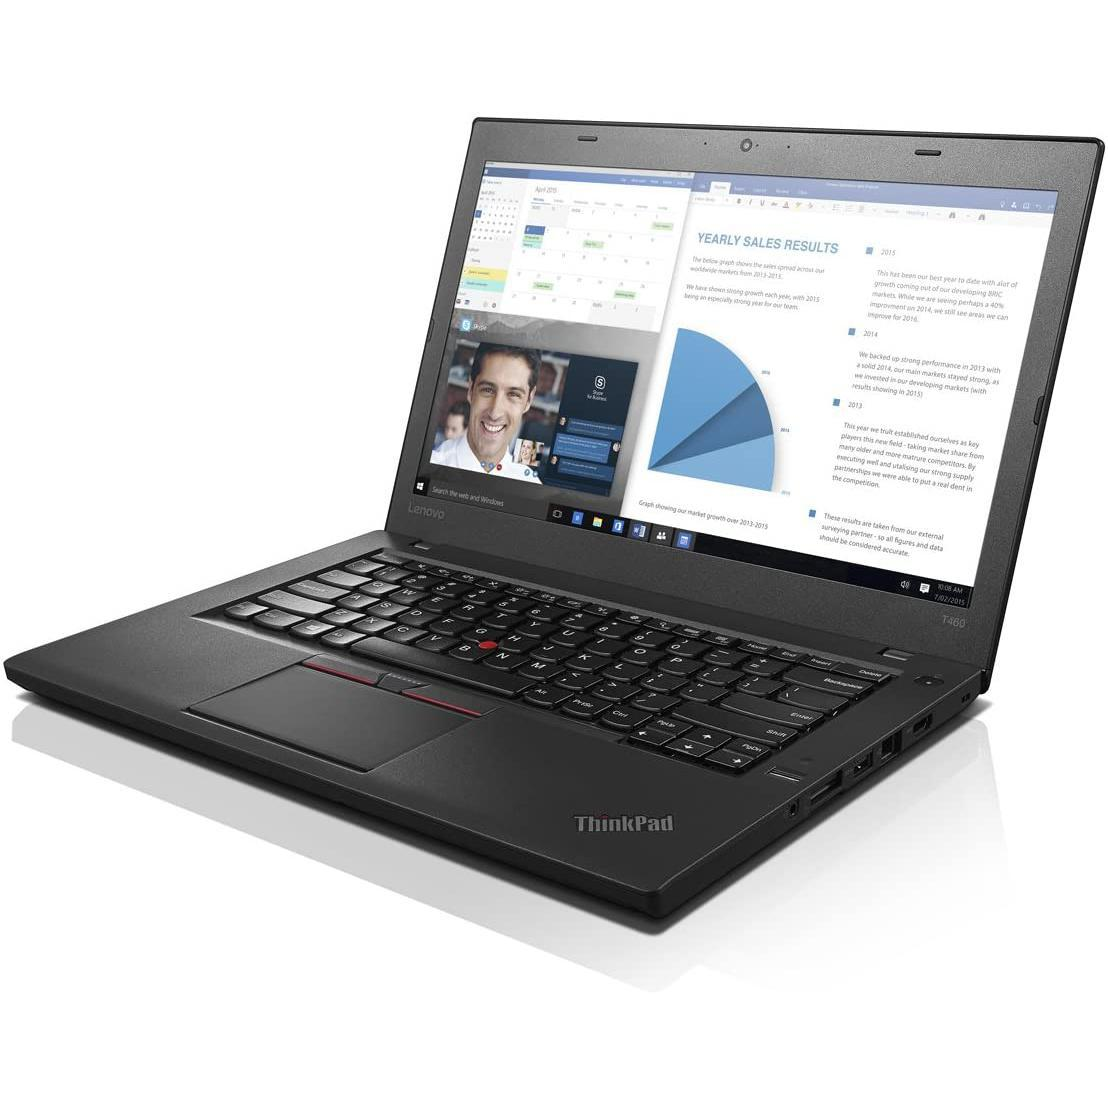 Lenovo ThinkPad T460 14-inch (2016) - Core i5-6300U - 8 GB - SSD 128 GB